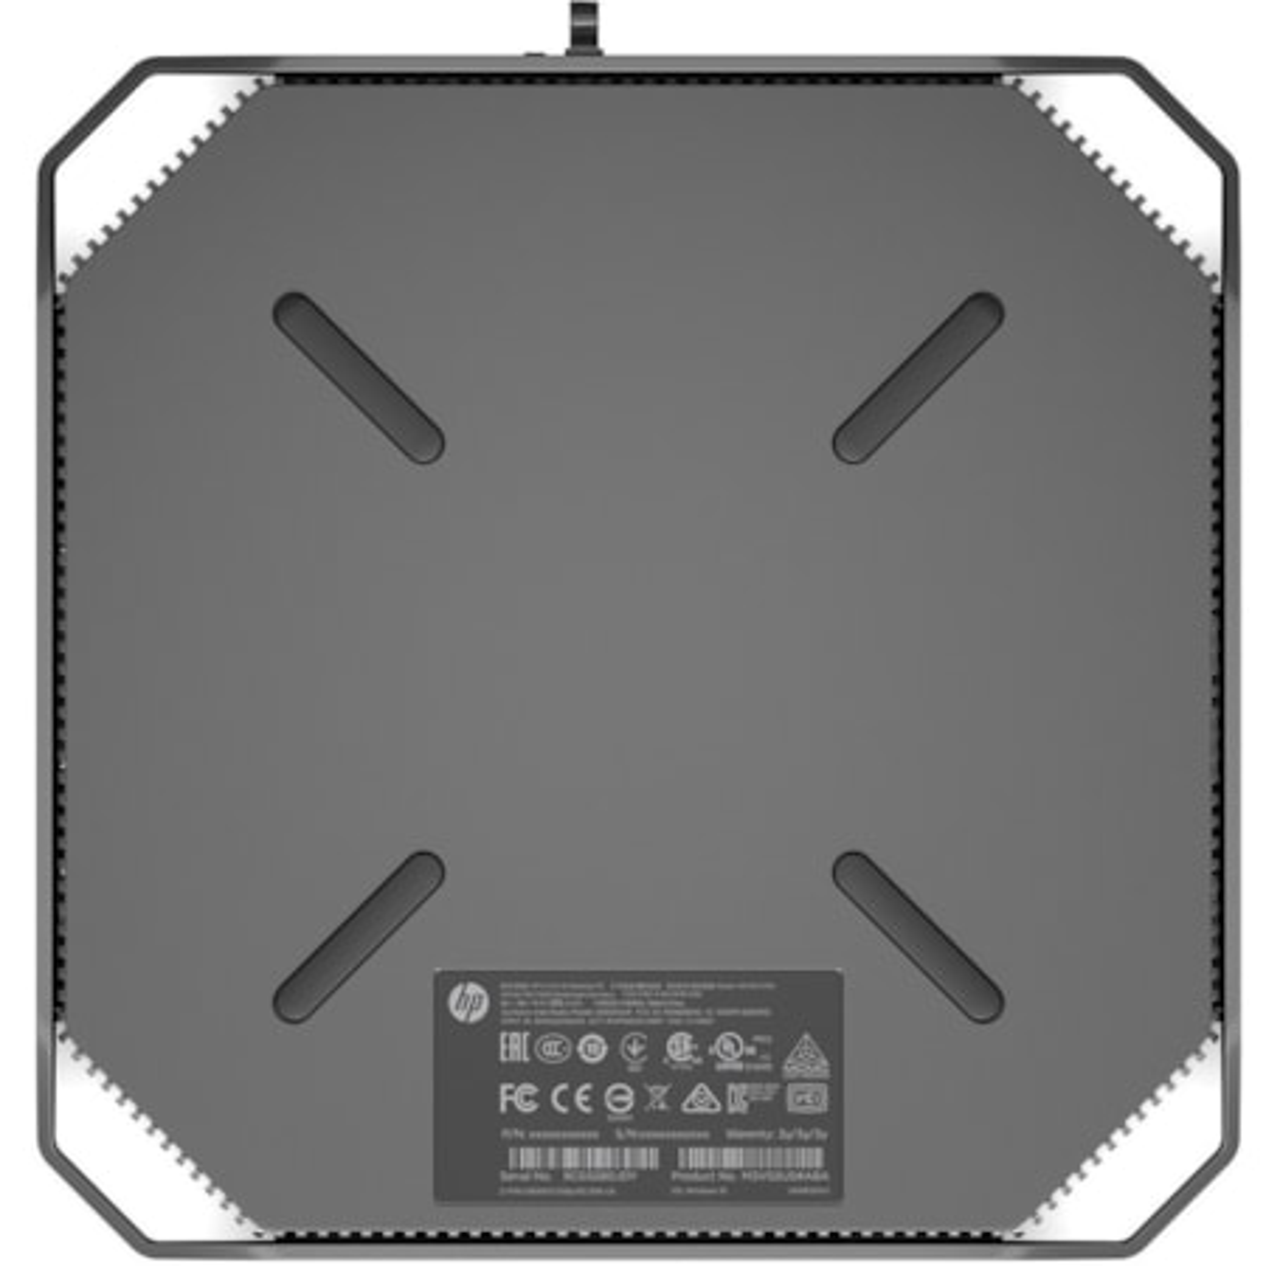 HP Z2 Mini G4 Workstation - 1 x Xeon E-2224G - 16 GB RAM - 1 TB HDD - 512 GB SSD - Mini PC - Space Gray, Black Chrome Accent